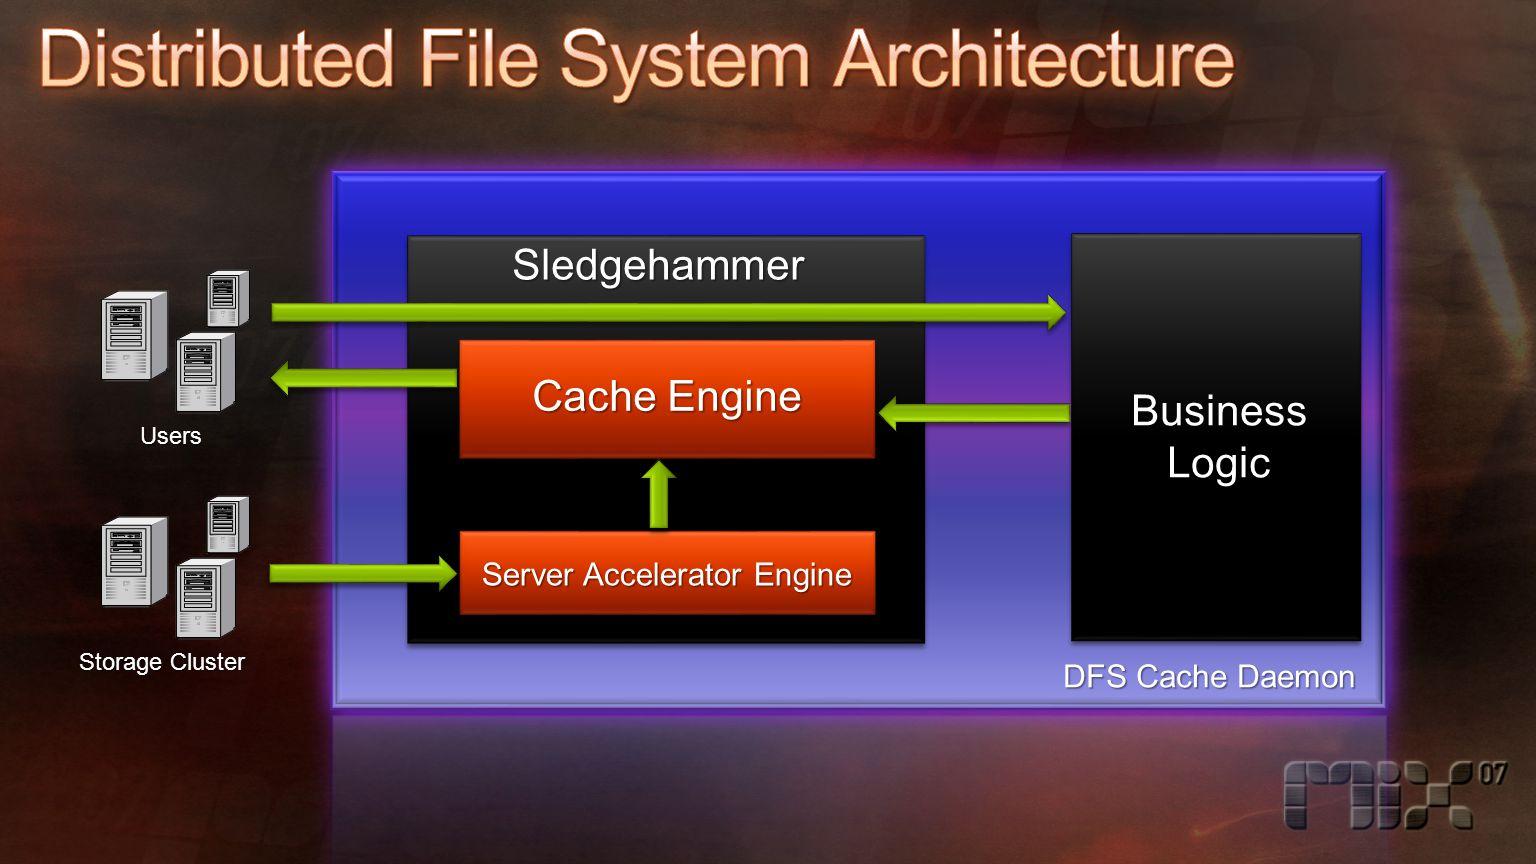 Storage Cluster Users DFS Cache Daemon BusinessLogic Sledgehammer Cache Engine Server Accelerator Engine